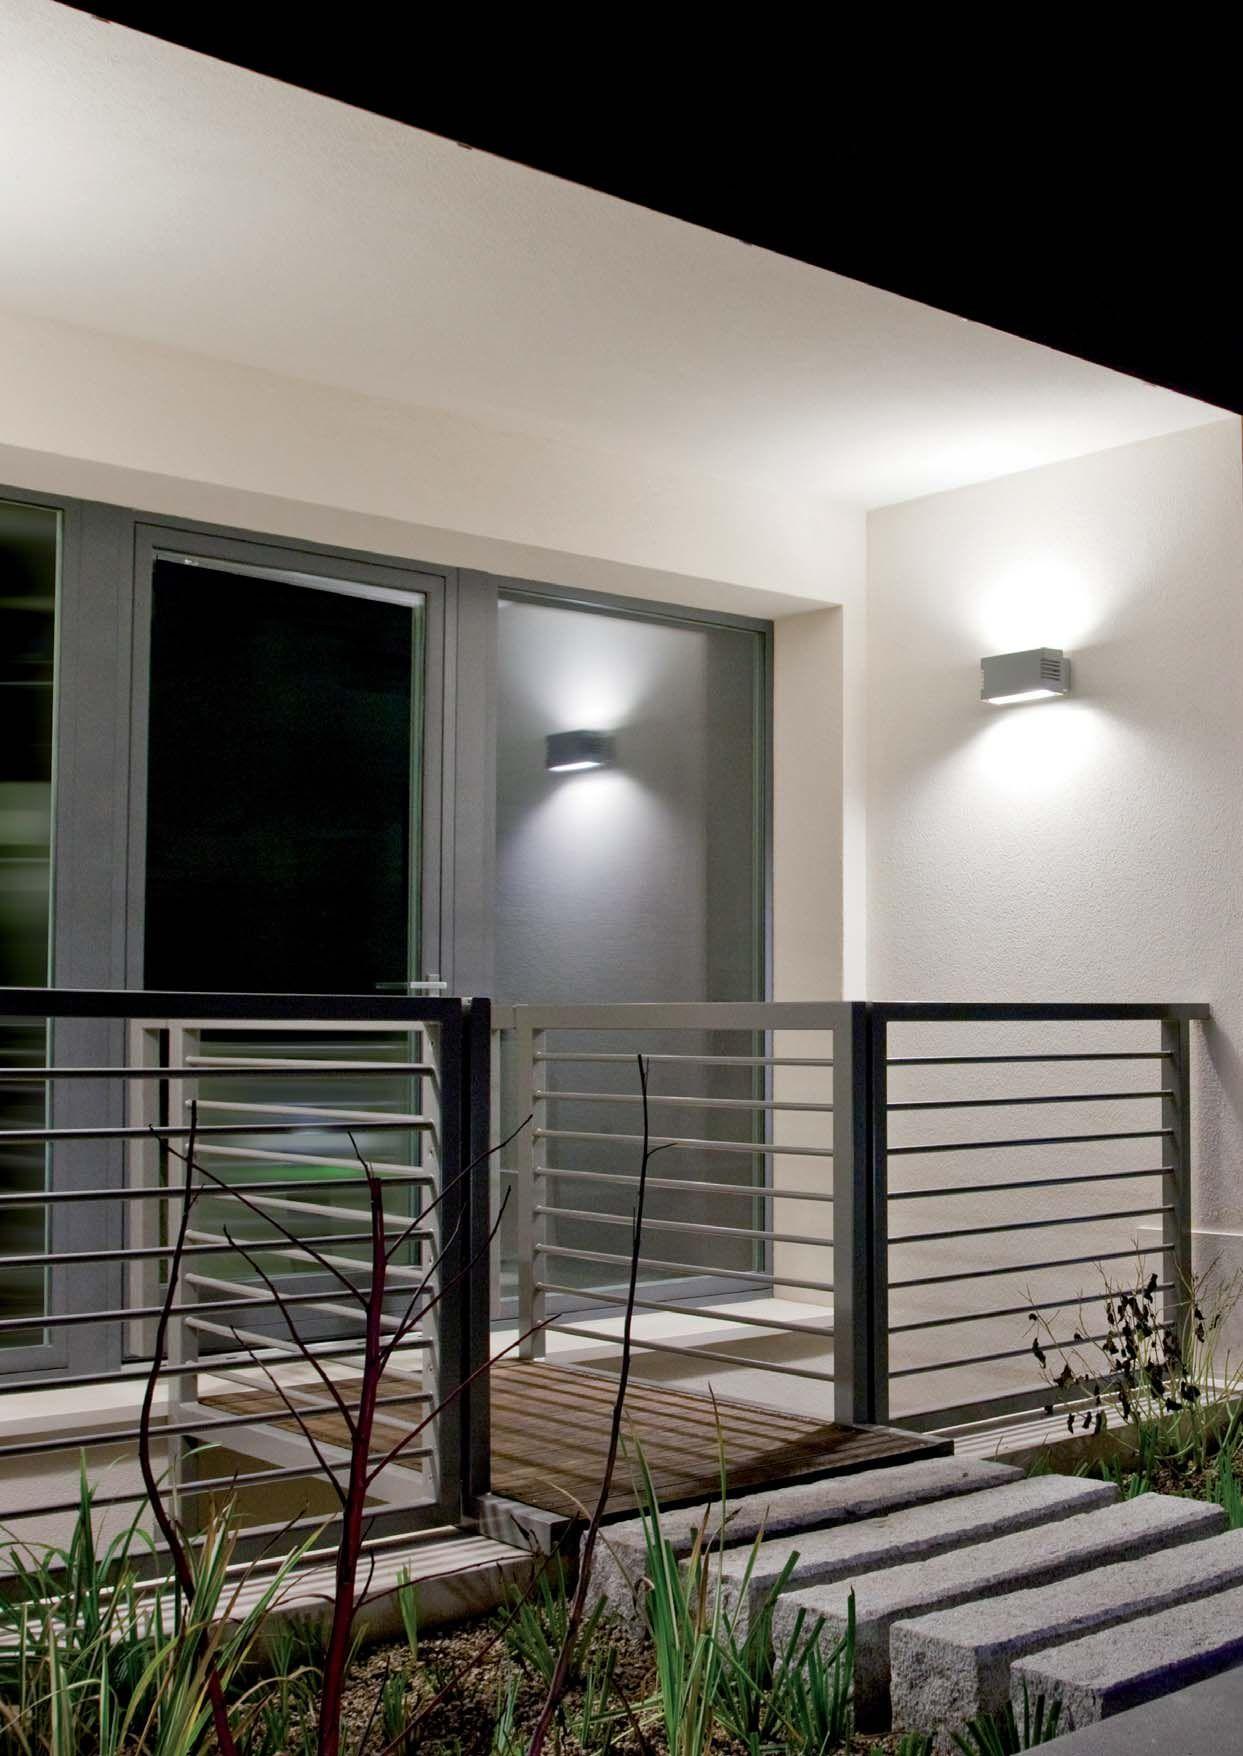 Iluminaci n t cnica para exterior con luz fluorescente - Iluminacion exterior led ...